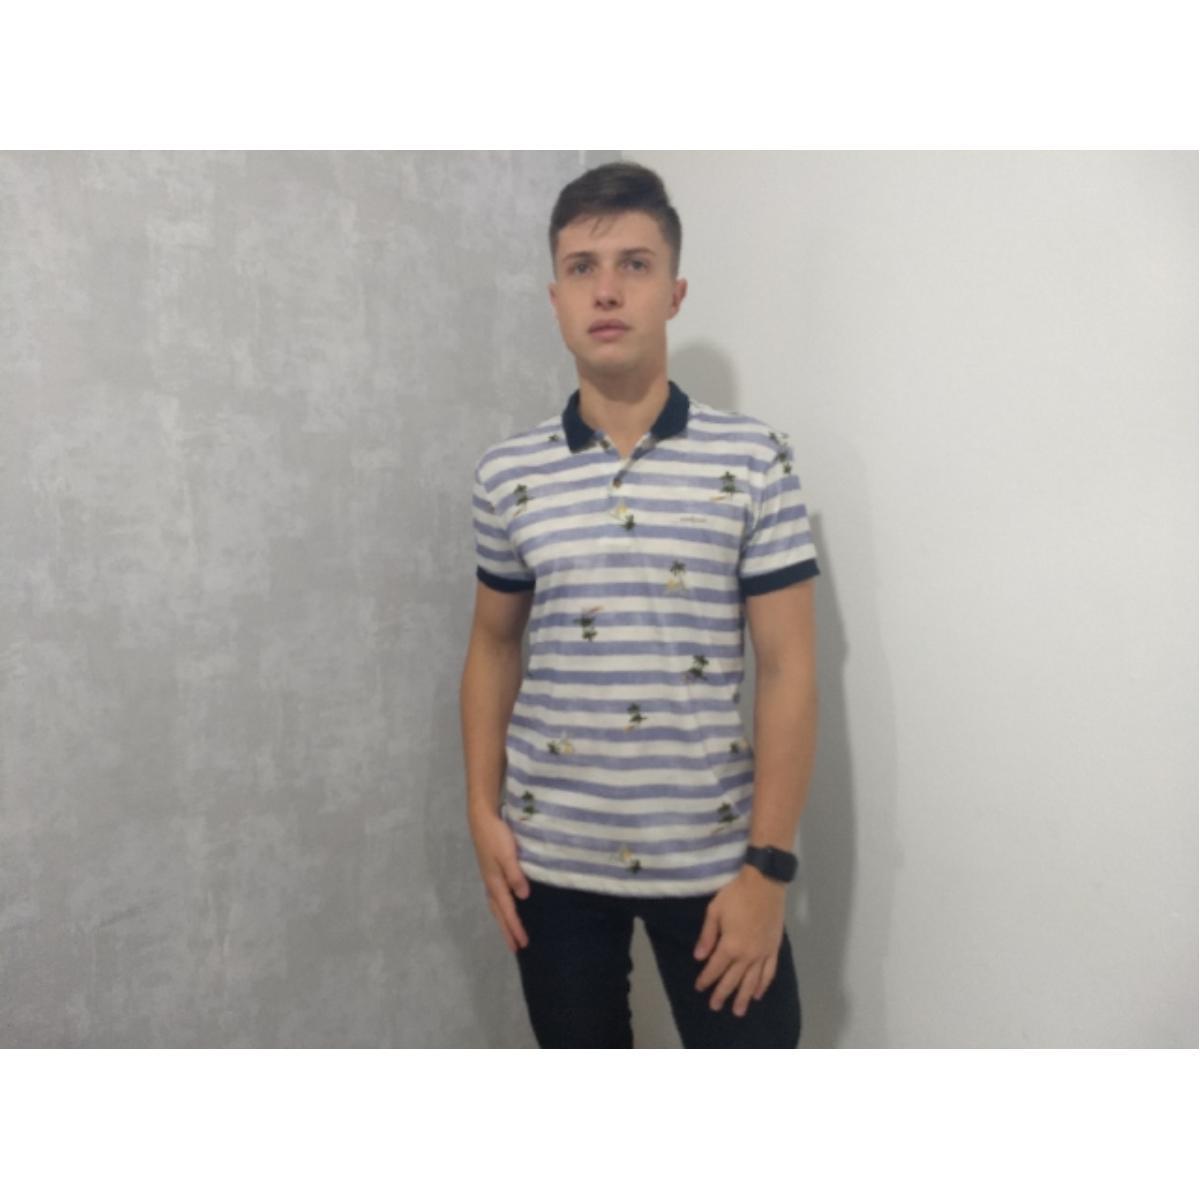 Camiseta Masculina Colcci 250102458 Vc34 Branco Listrado/azul